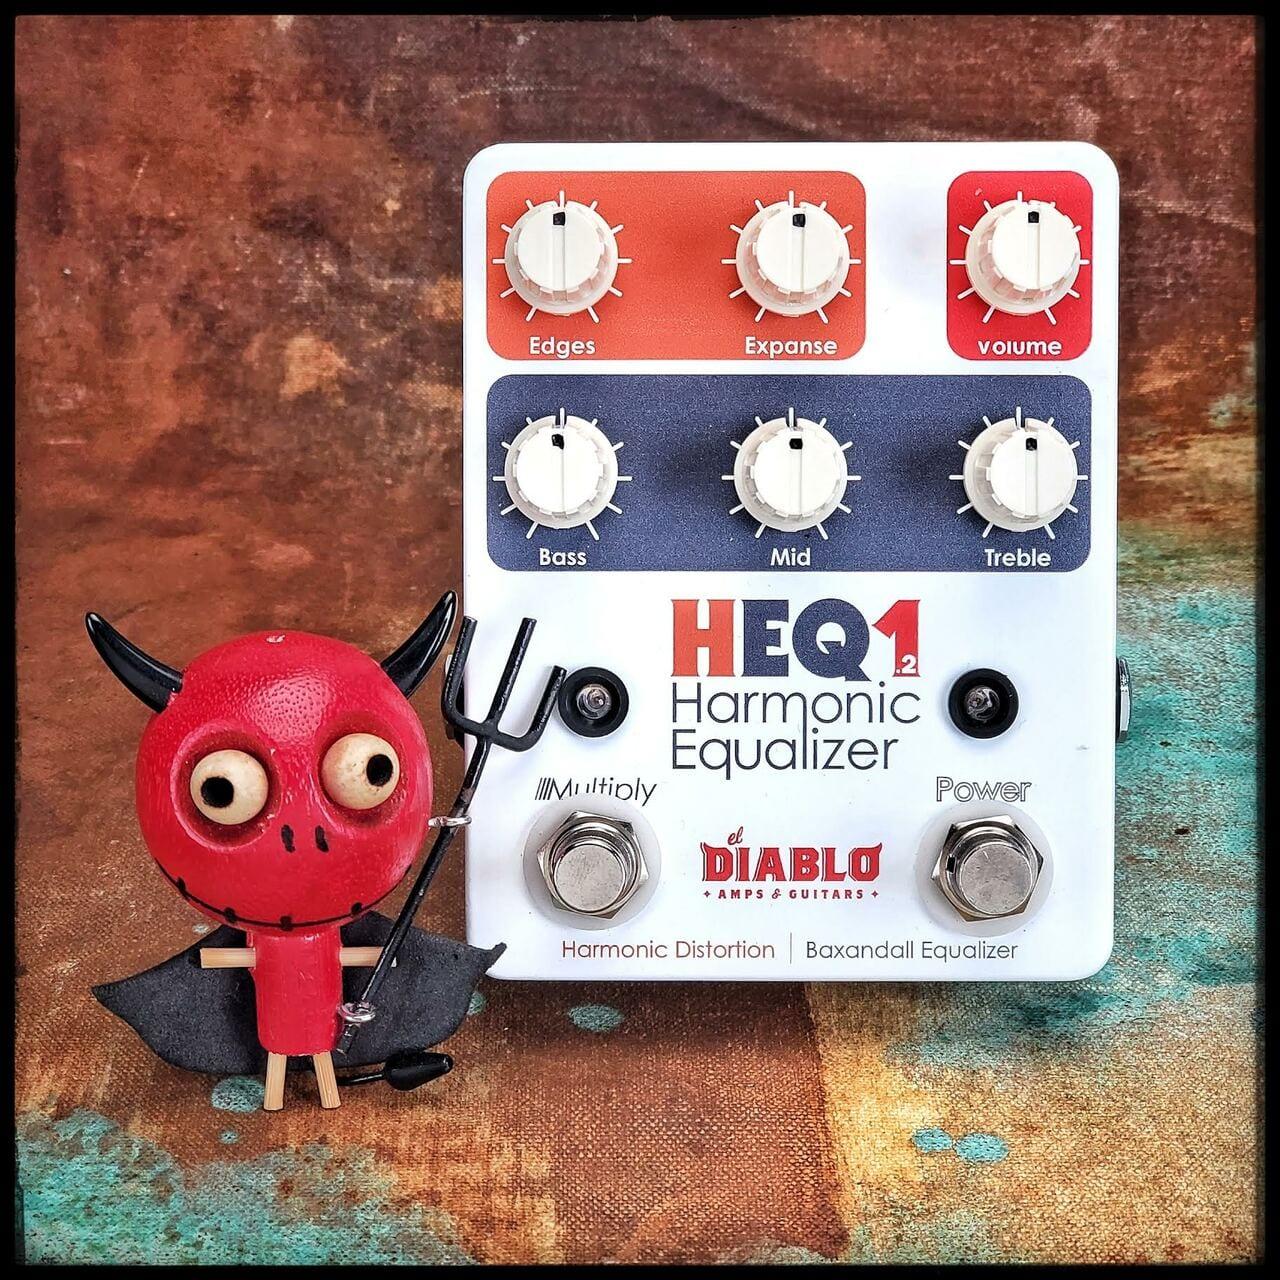 Nuevo fuzz Harmonic Equalizer HEQ1.2 de El Diablo Amps & Guitars